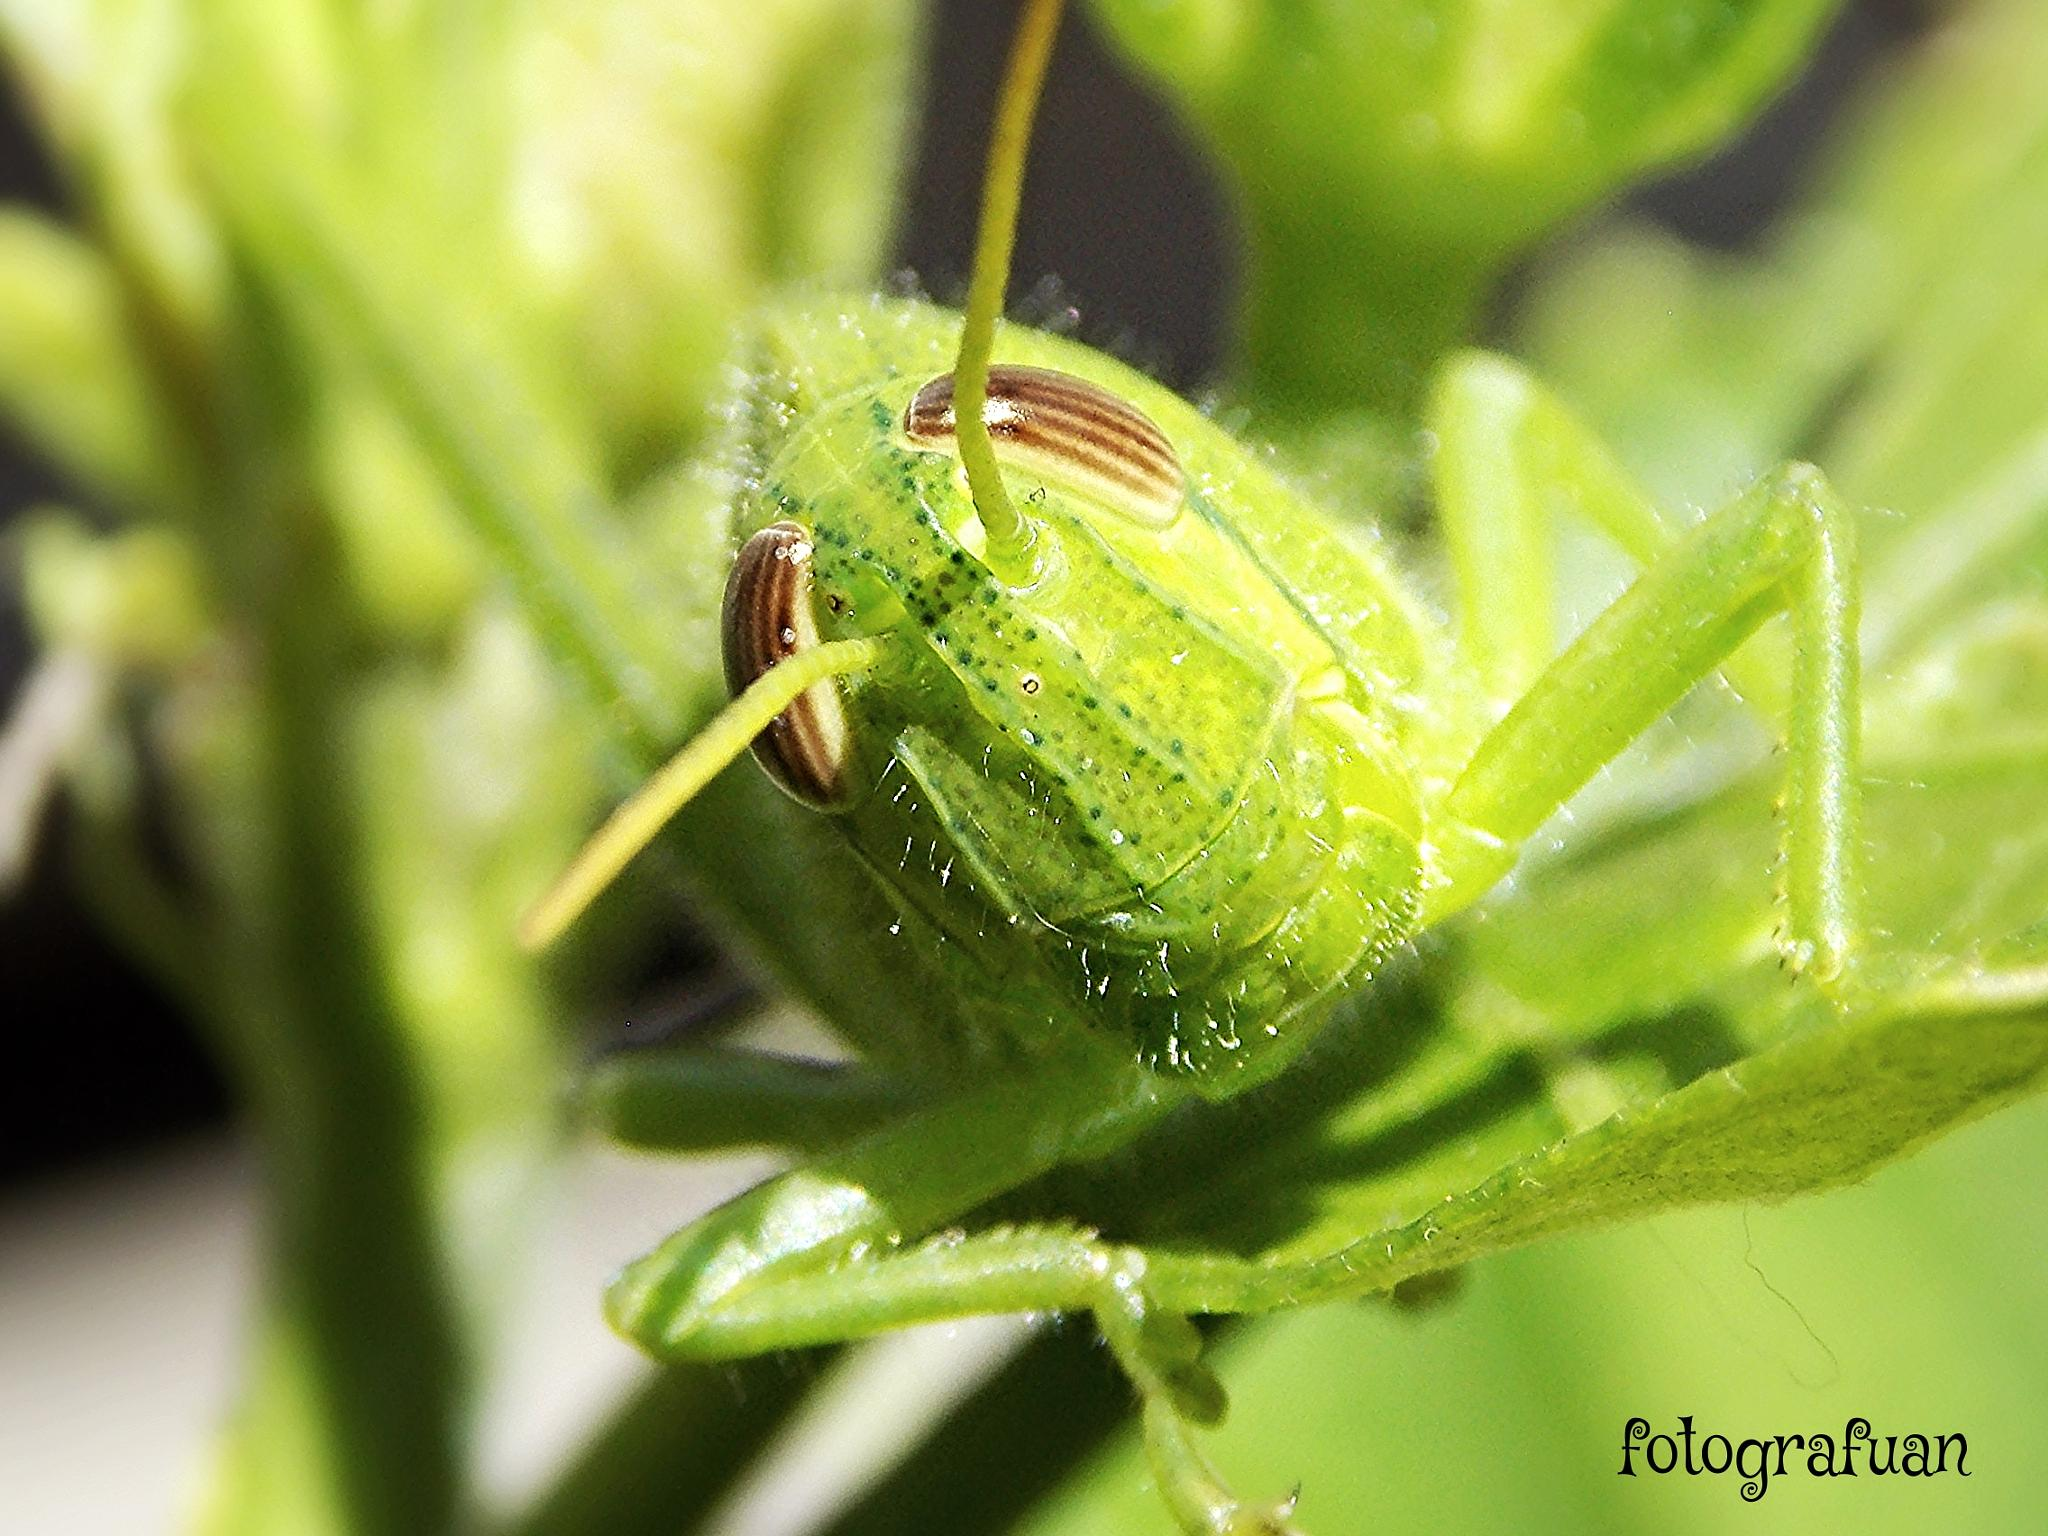 cricket green by Juan Carlos Saldarriaga Pantera